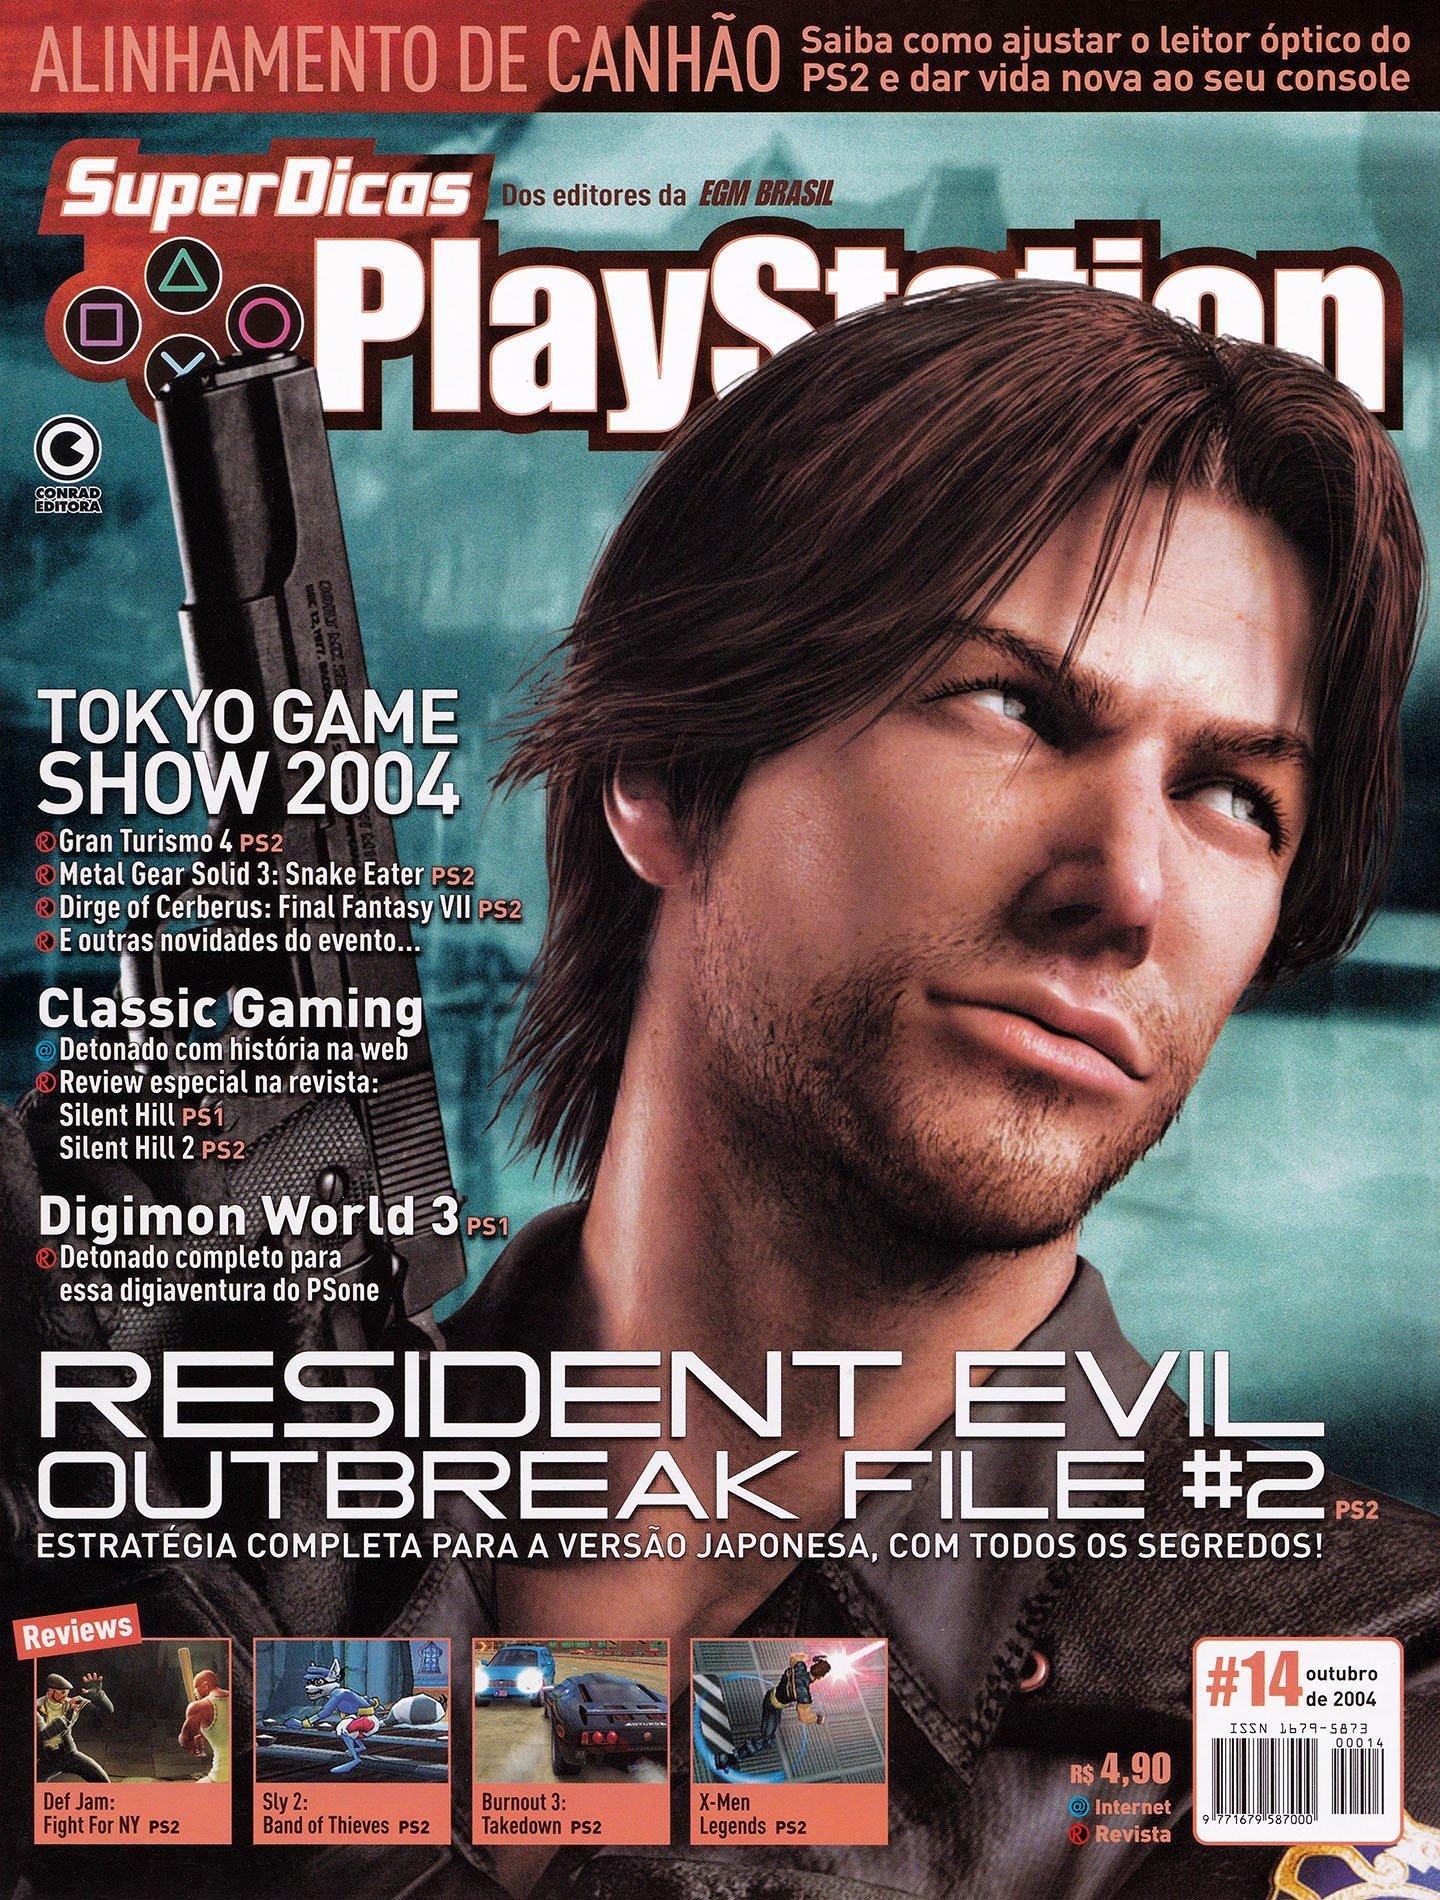 Super Dicas Playstation 14 (October 2004)